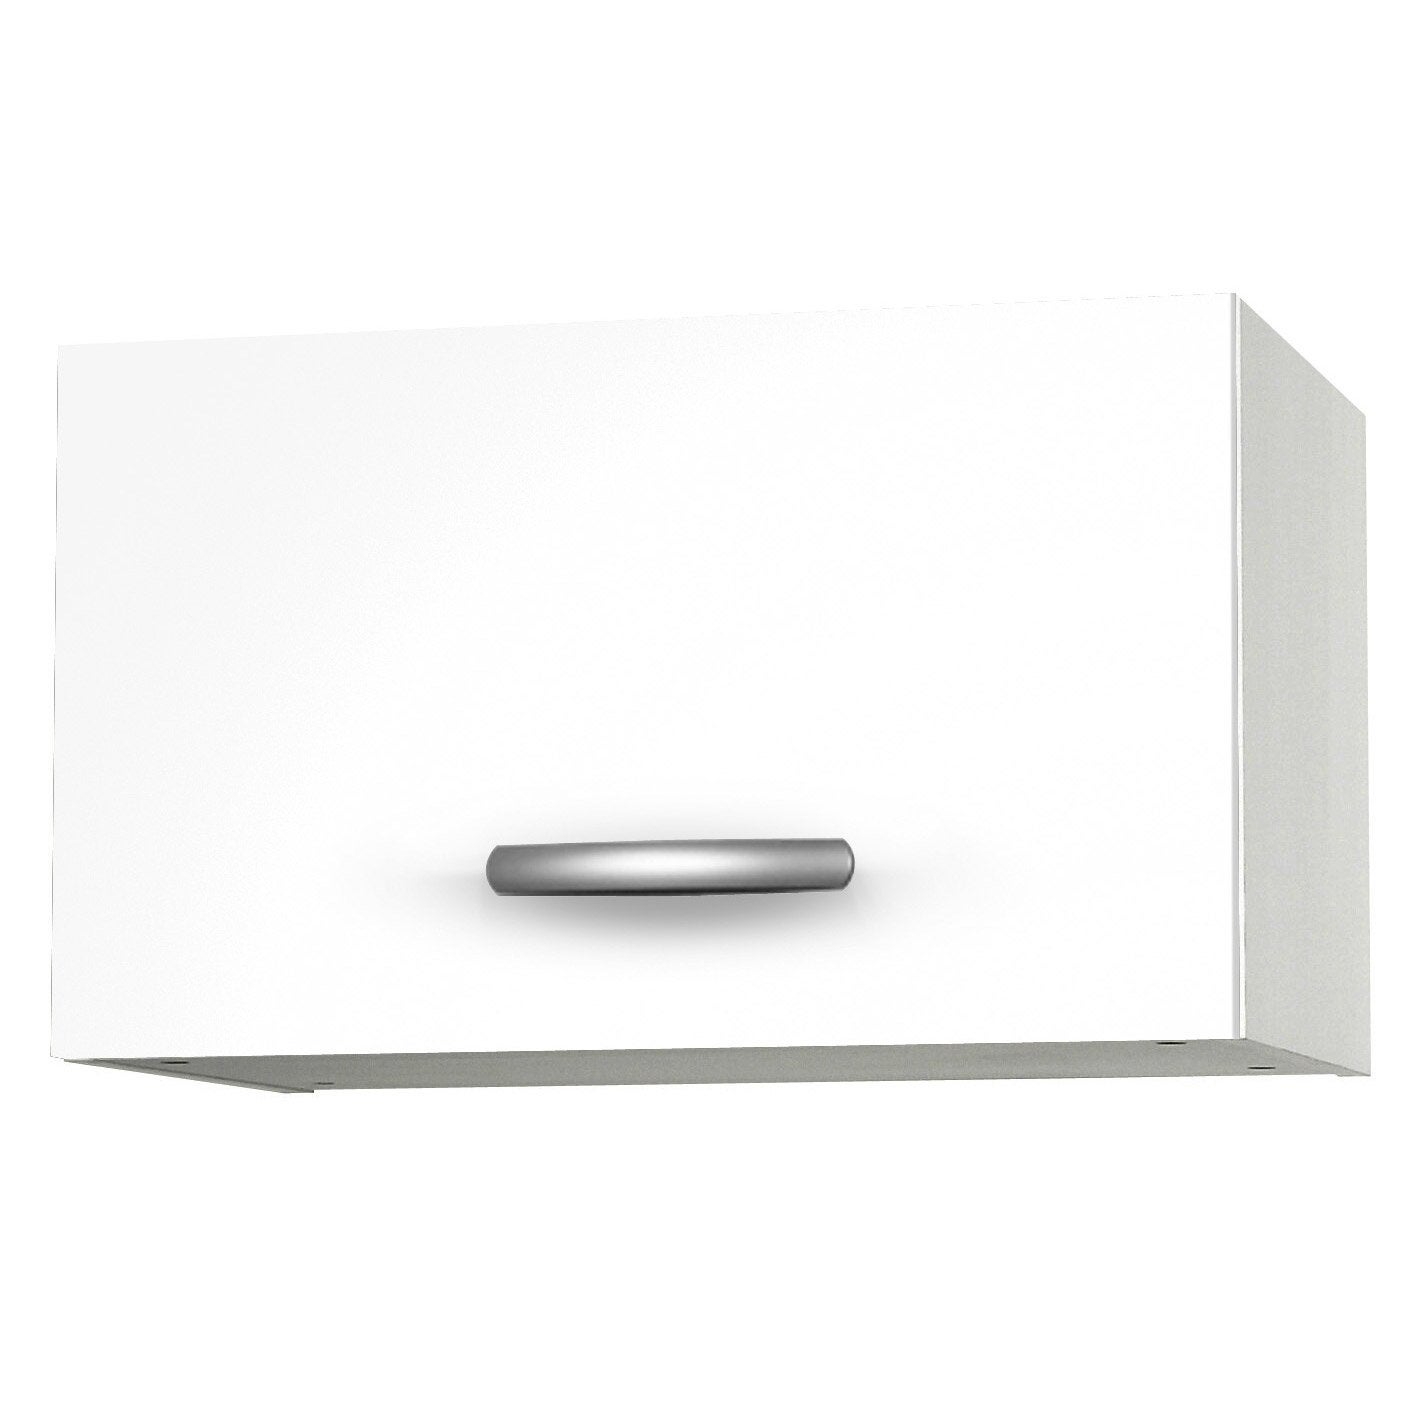 Meuble de cuisine haut 1 porte spring l60xh35xp35cm blanc - Porte meuble cuisine leroy merlin ...